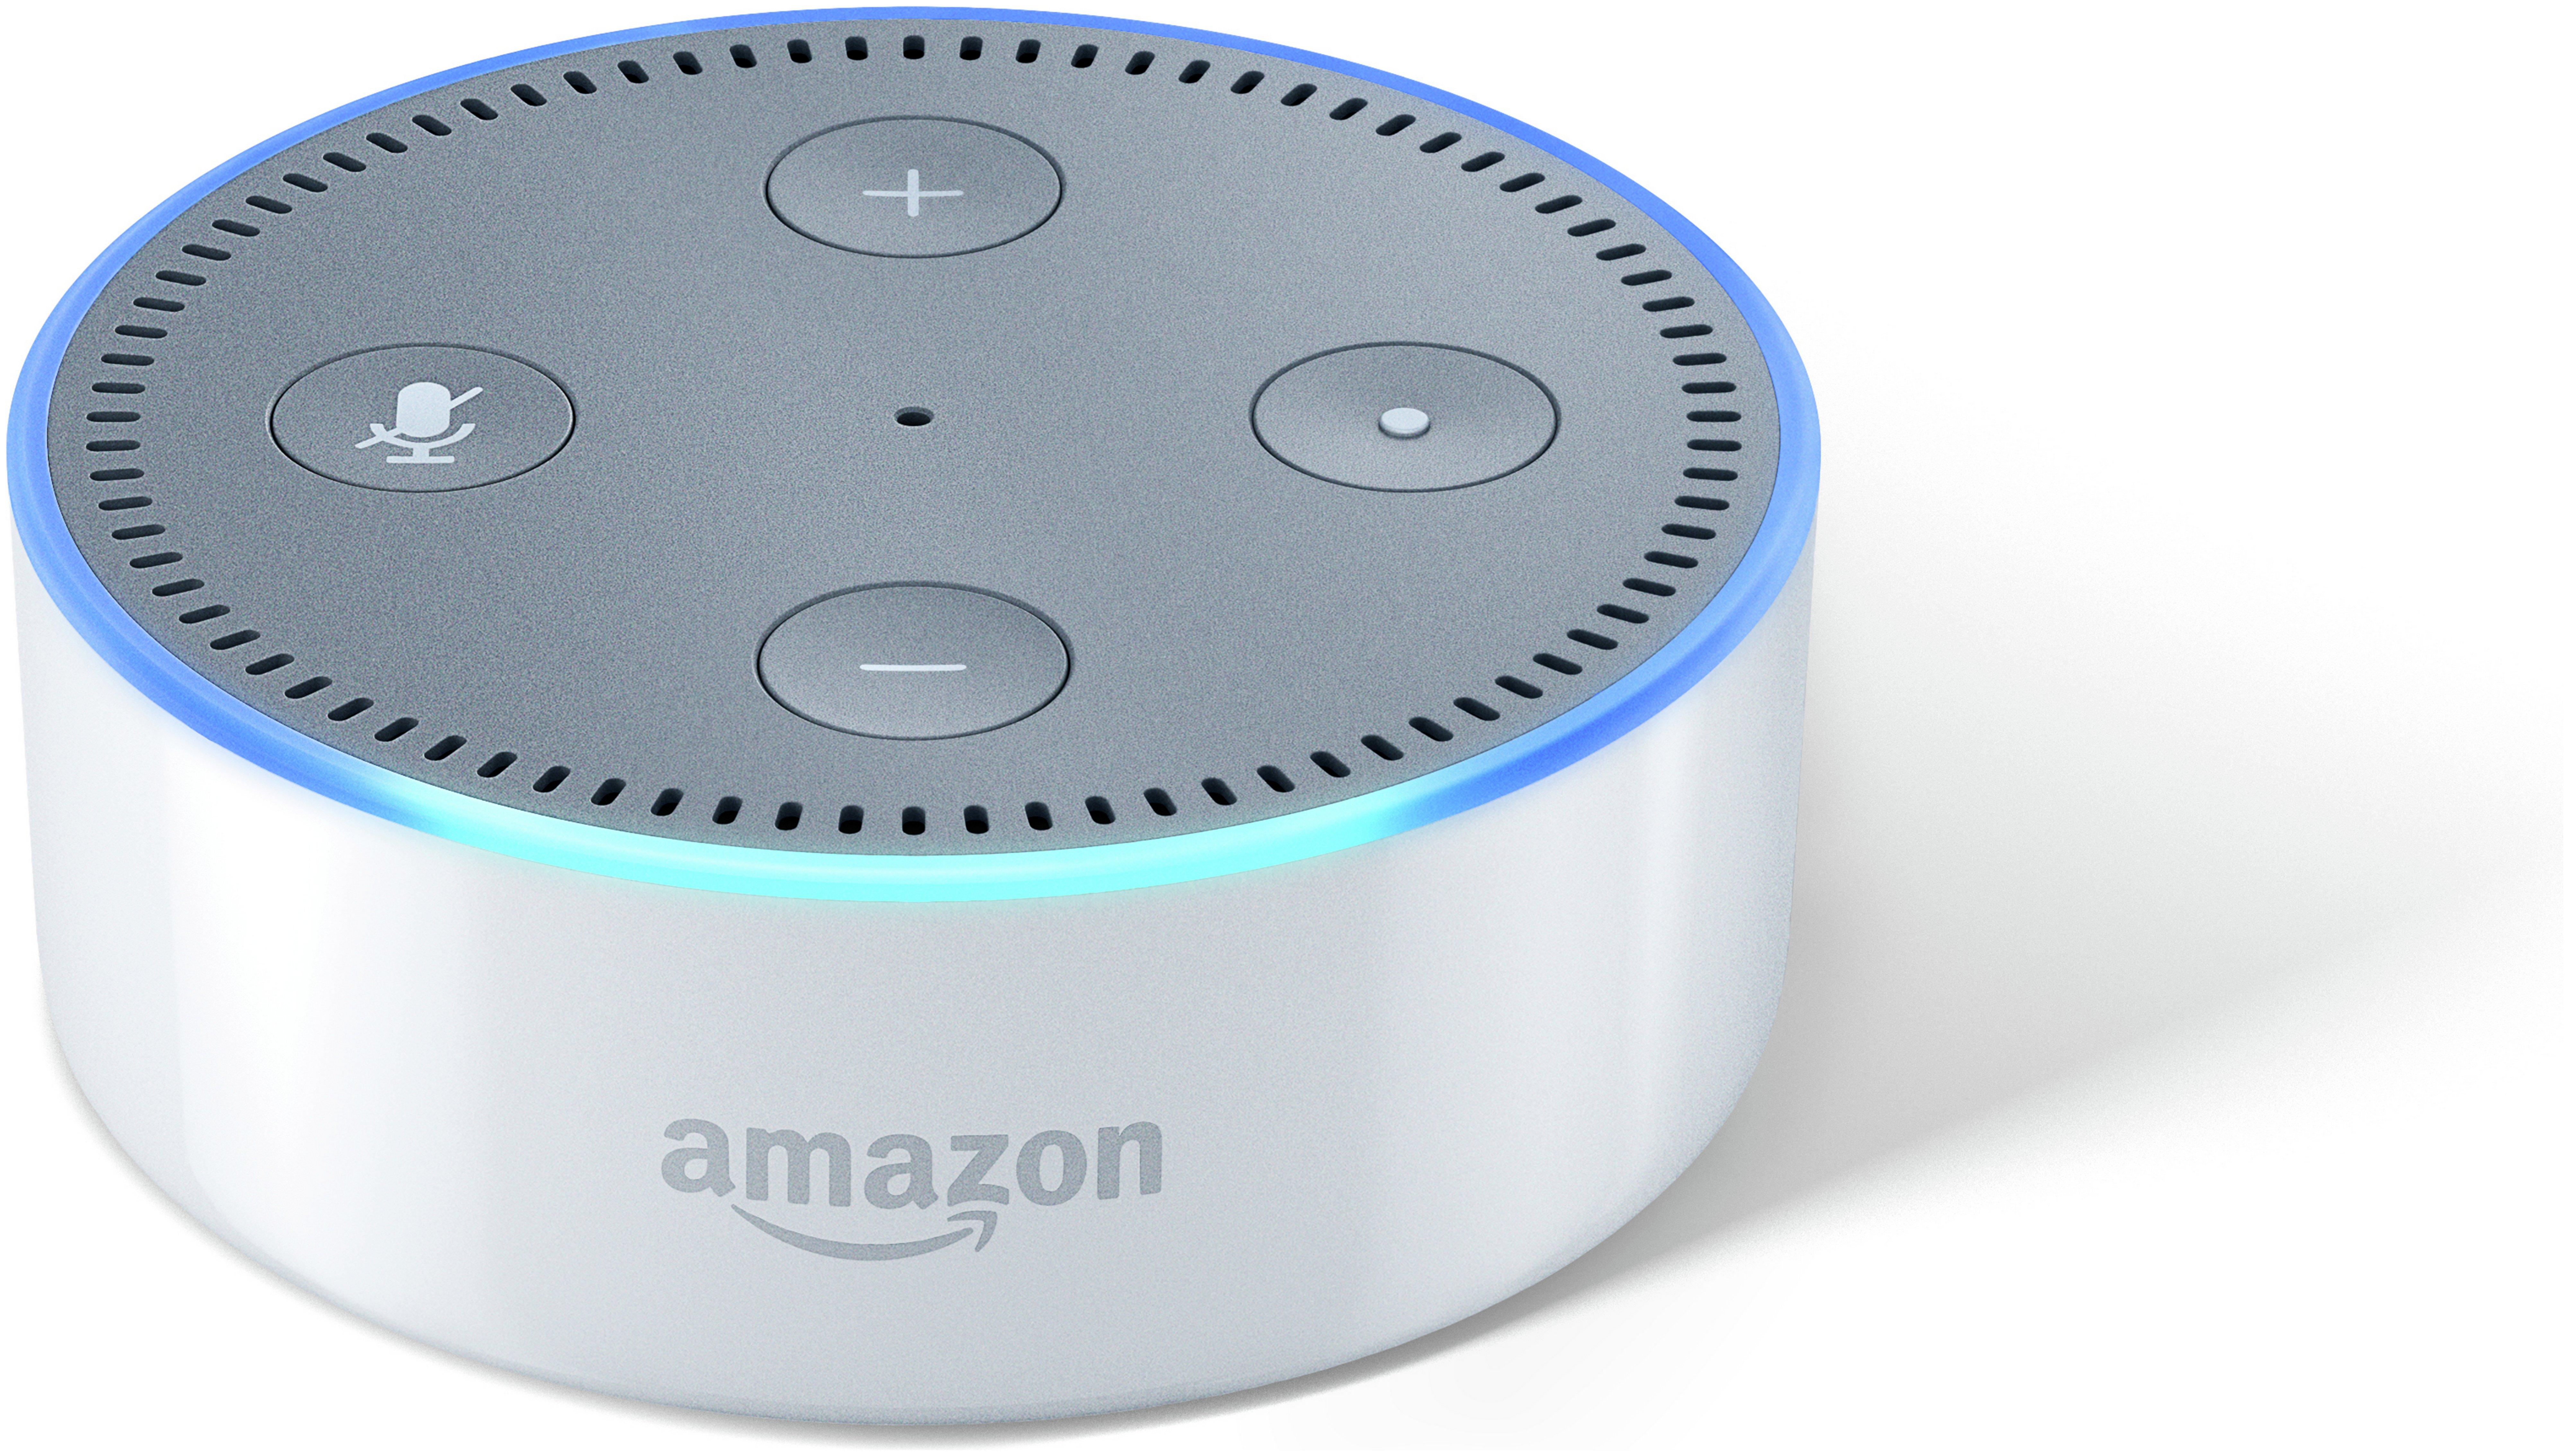 Amazon Echo Dot Multimedia Speaker - White